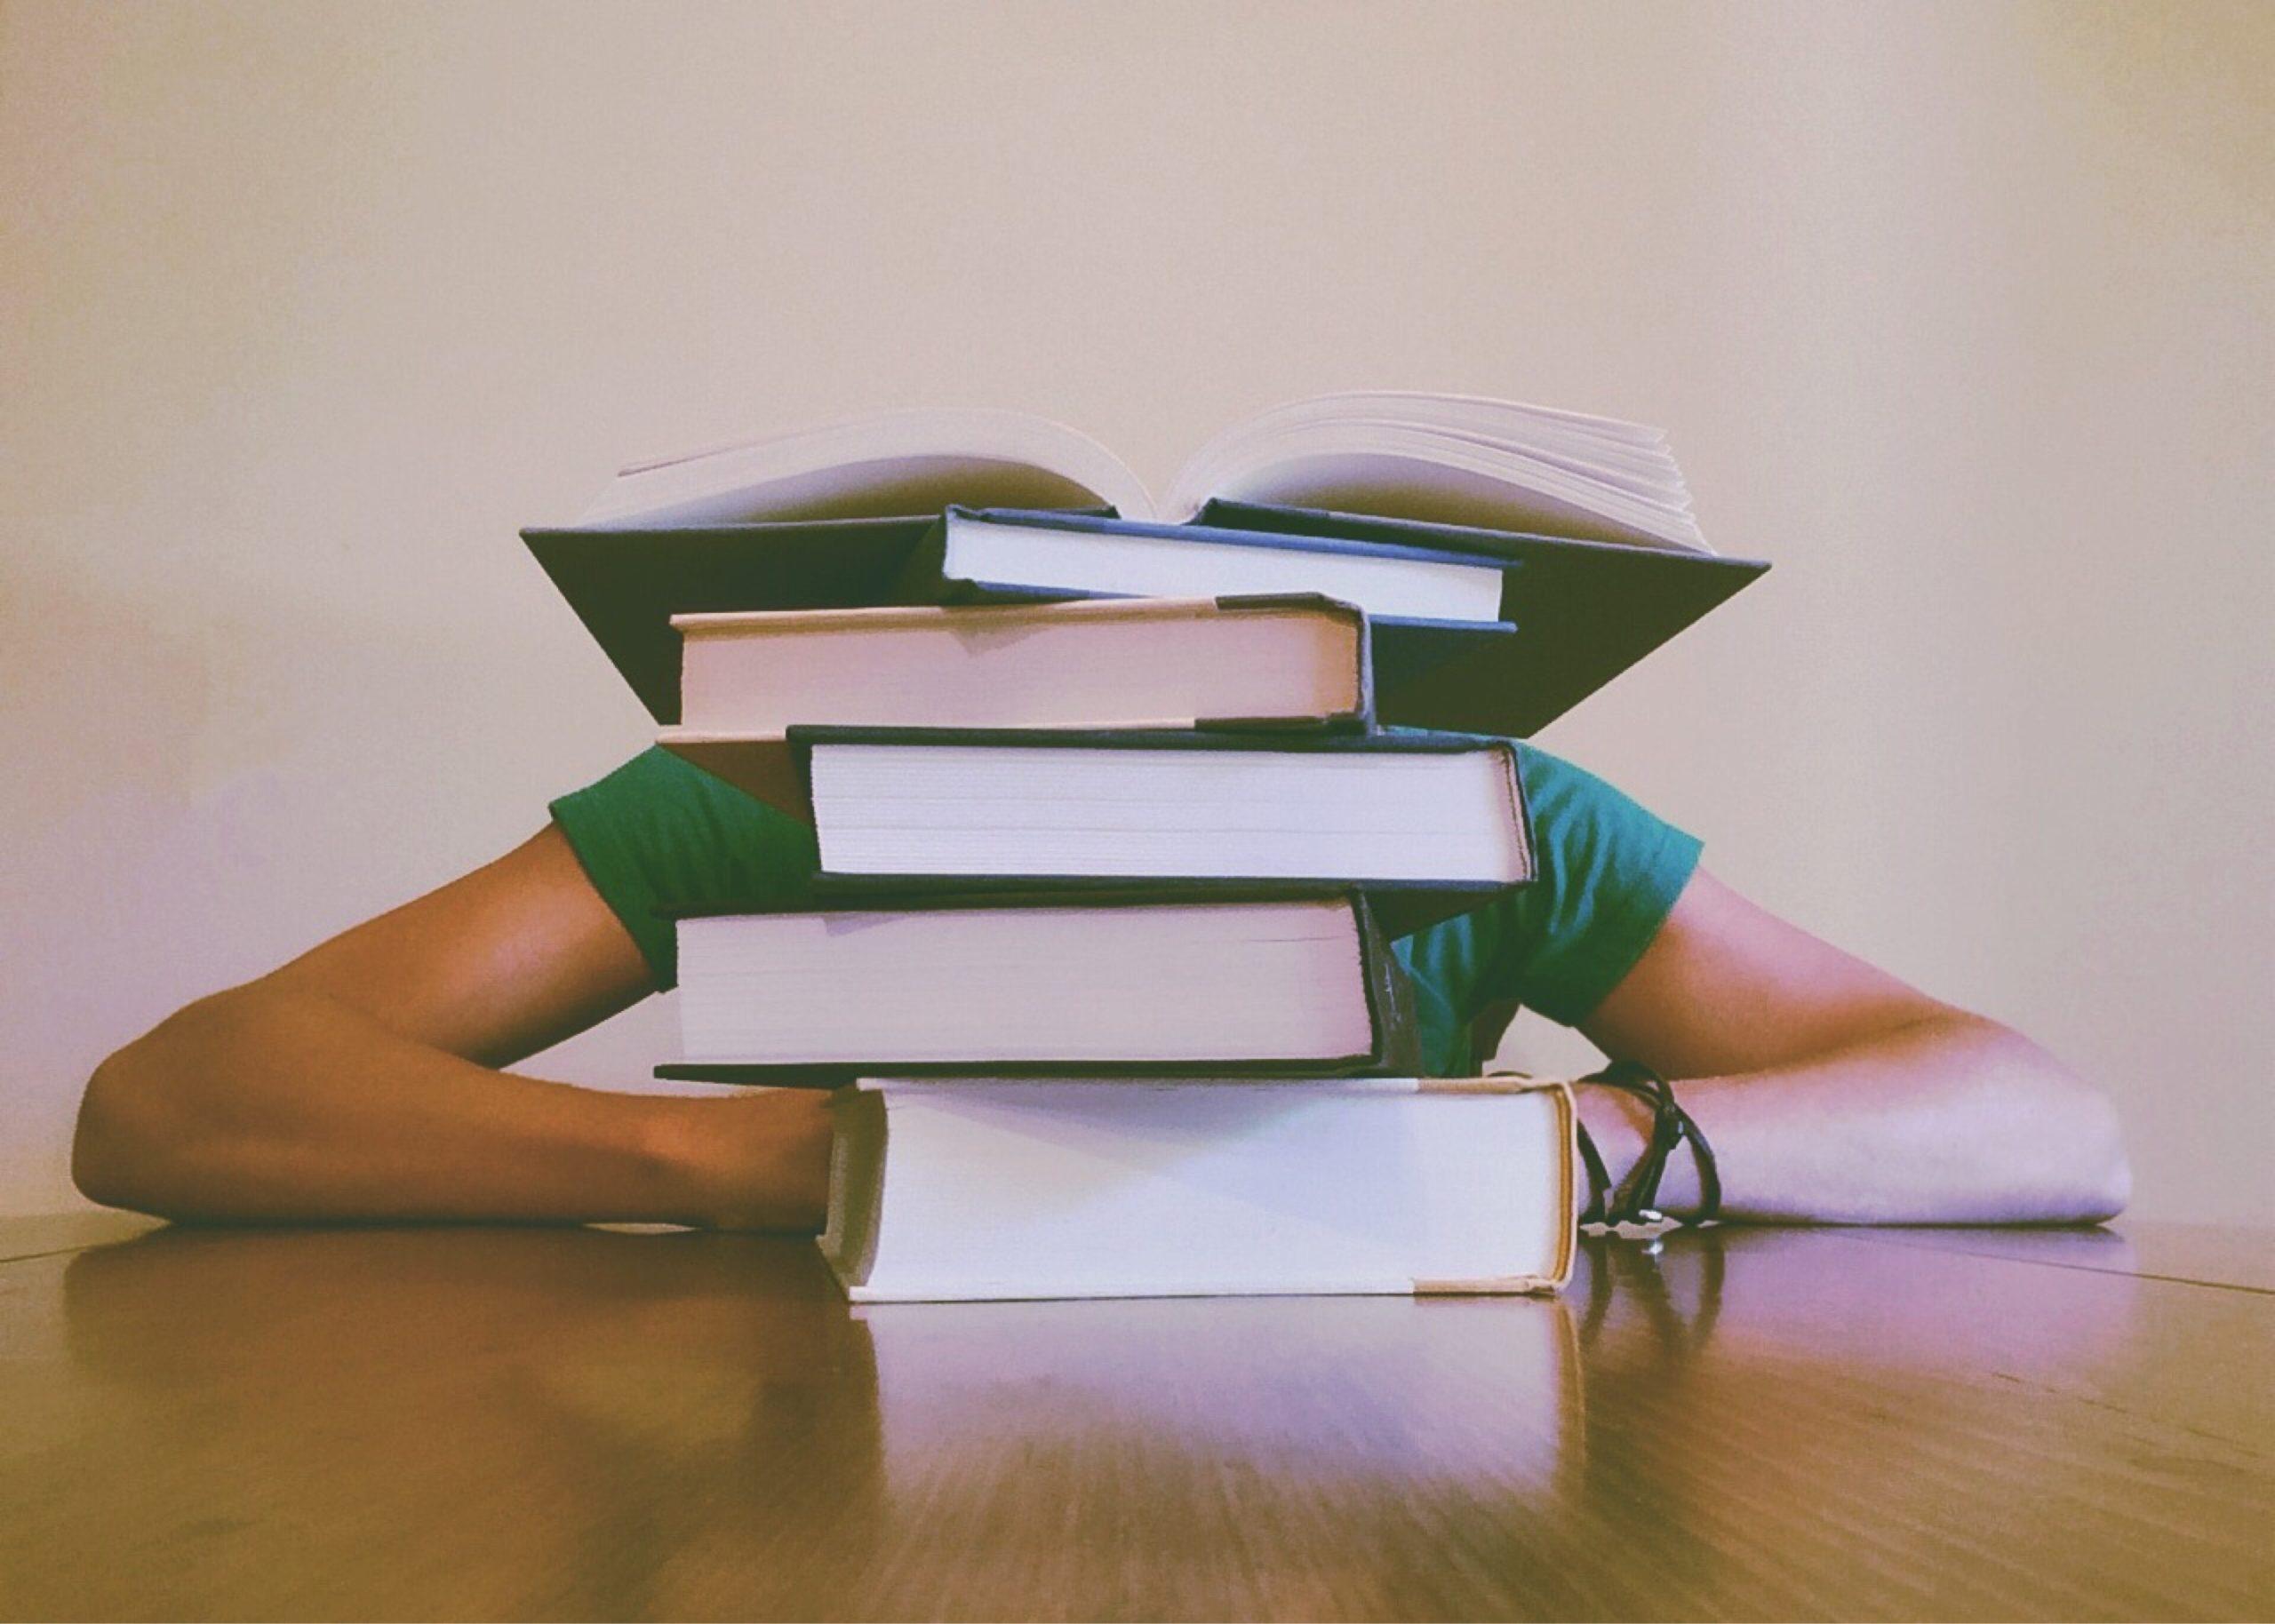 adult-blur-books-close-up-261909